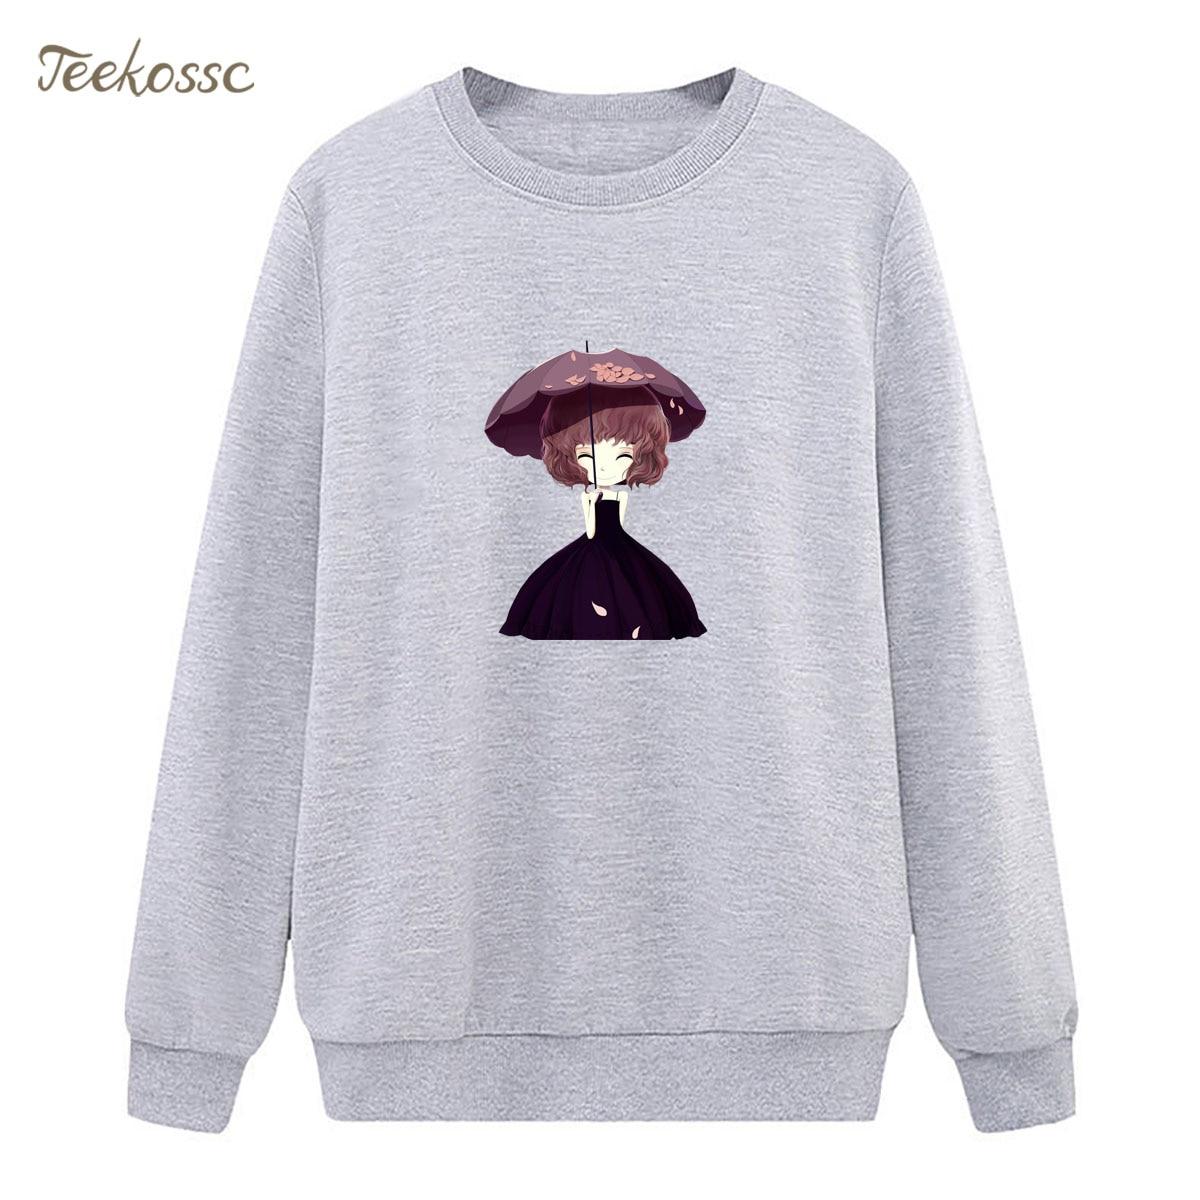 Girls Sweatshirt Hoodies Women 2019 New Fashion Spring Autumn Ladies Pullover Fleece Warm Streetwear Cute Brand Clothing